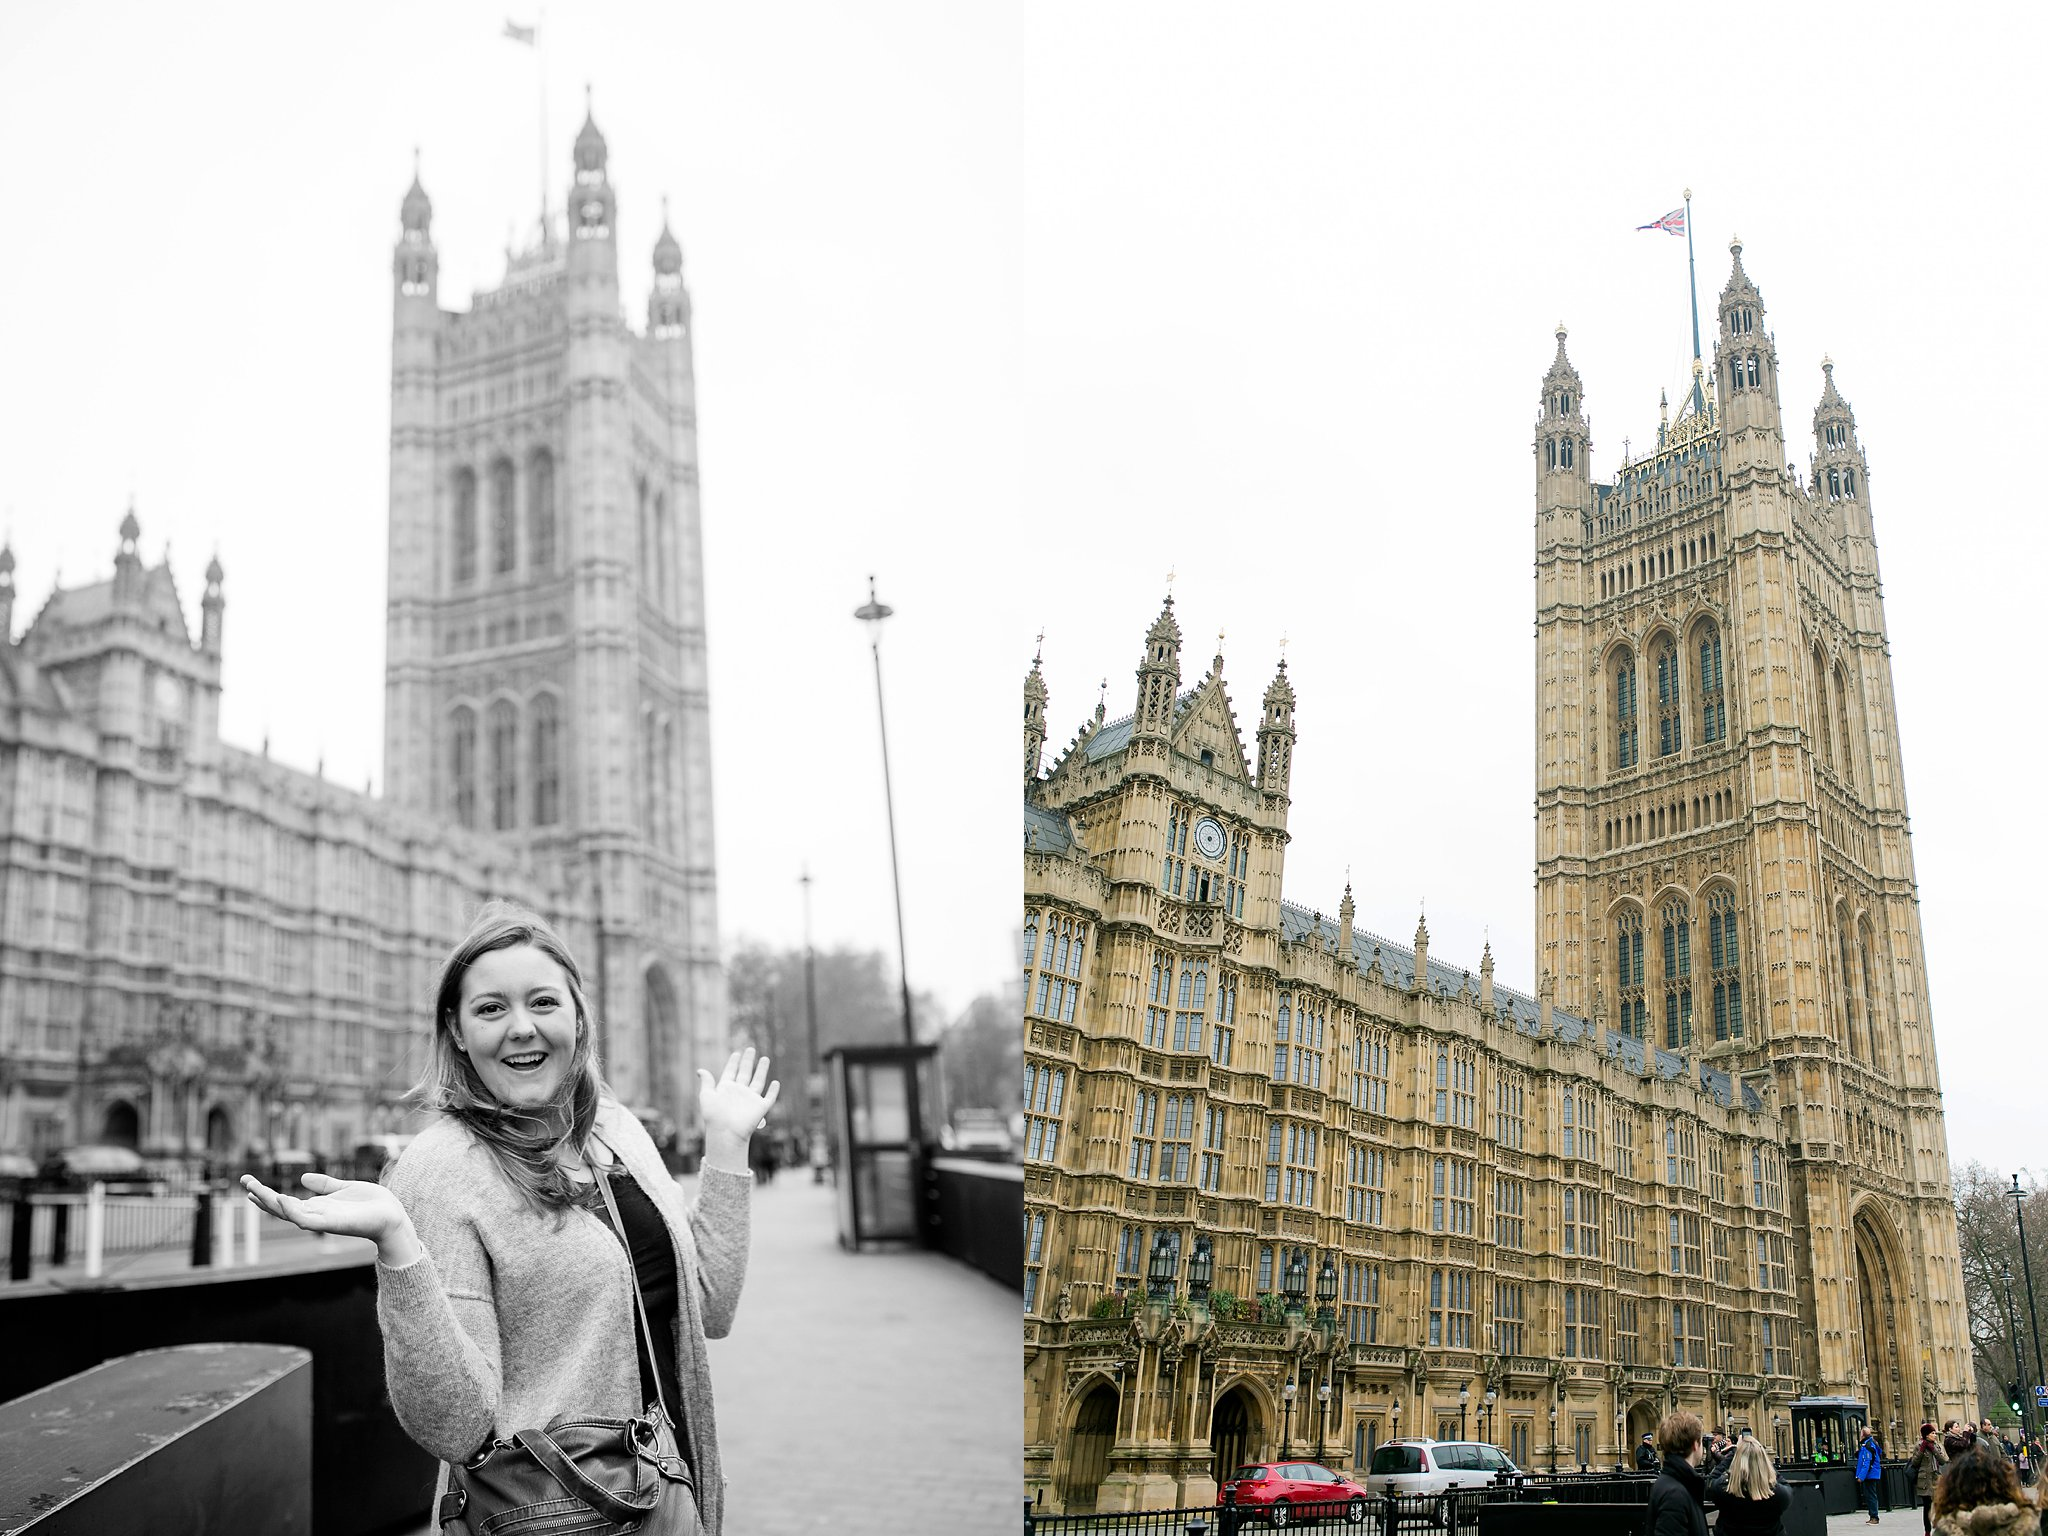 London Part II Westminster Abbey Tower Bridge Tower of London Big Ben-1820.jpg